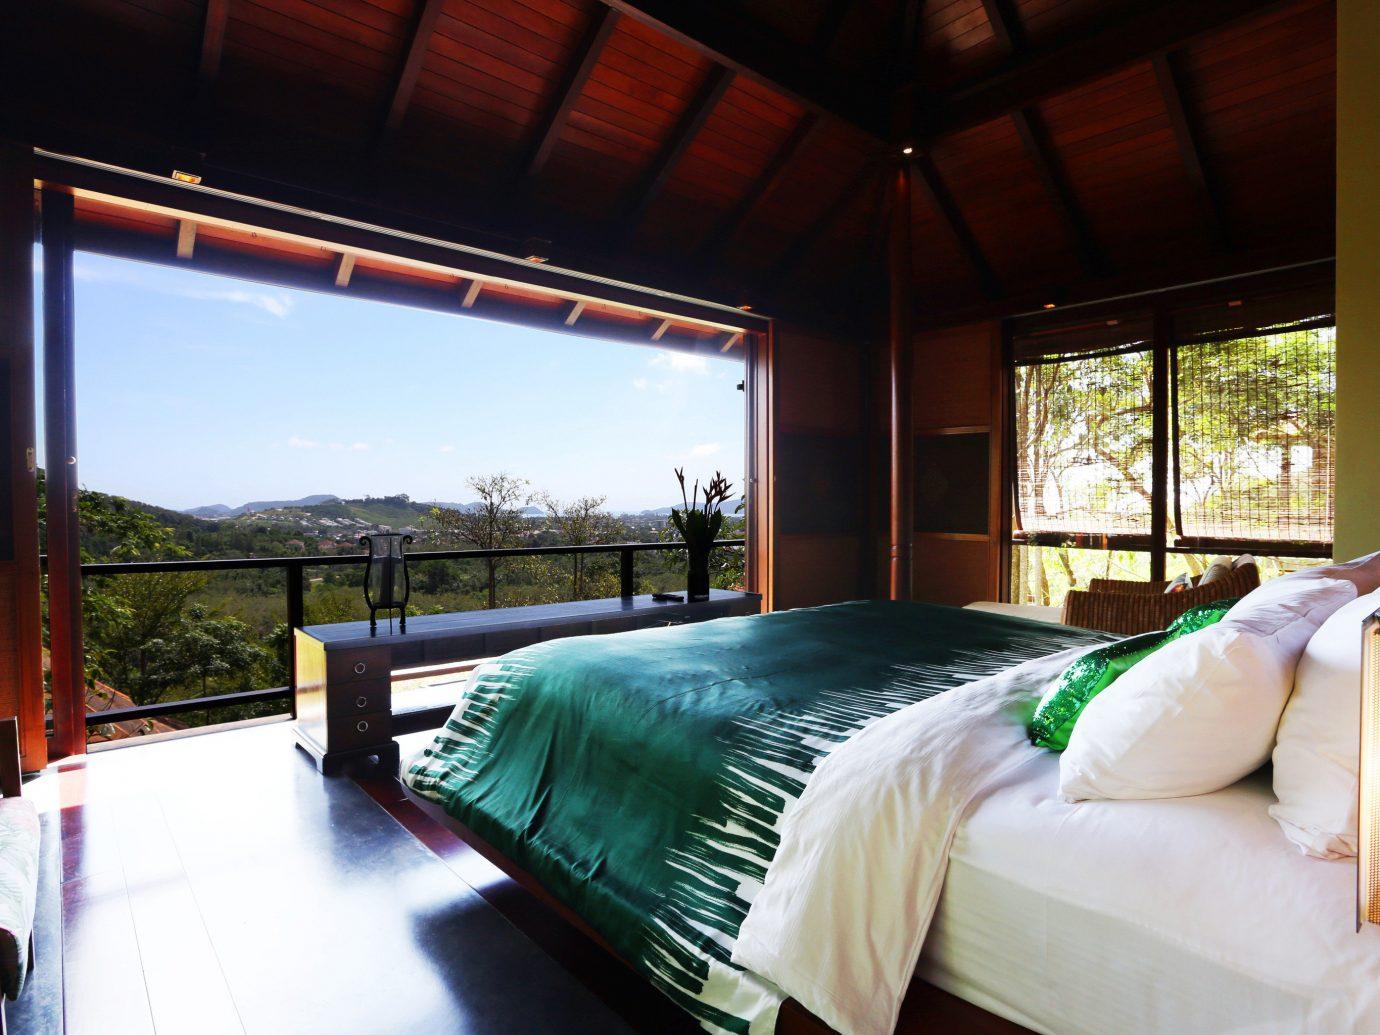 Hotels bed window indoor room sofa Bedroom property hotel ceiling pillow real estate house interior design estate home Modern furniture